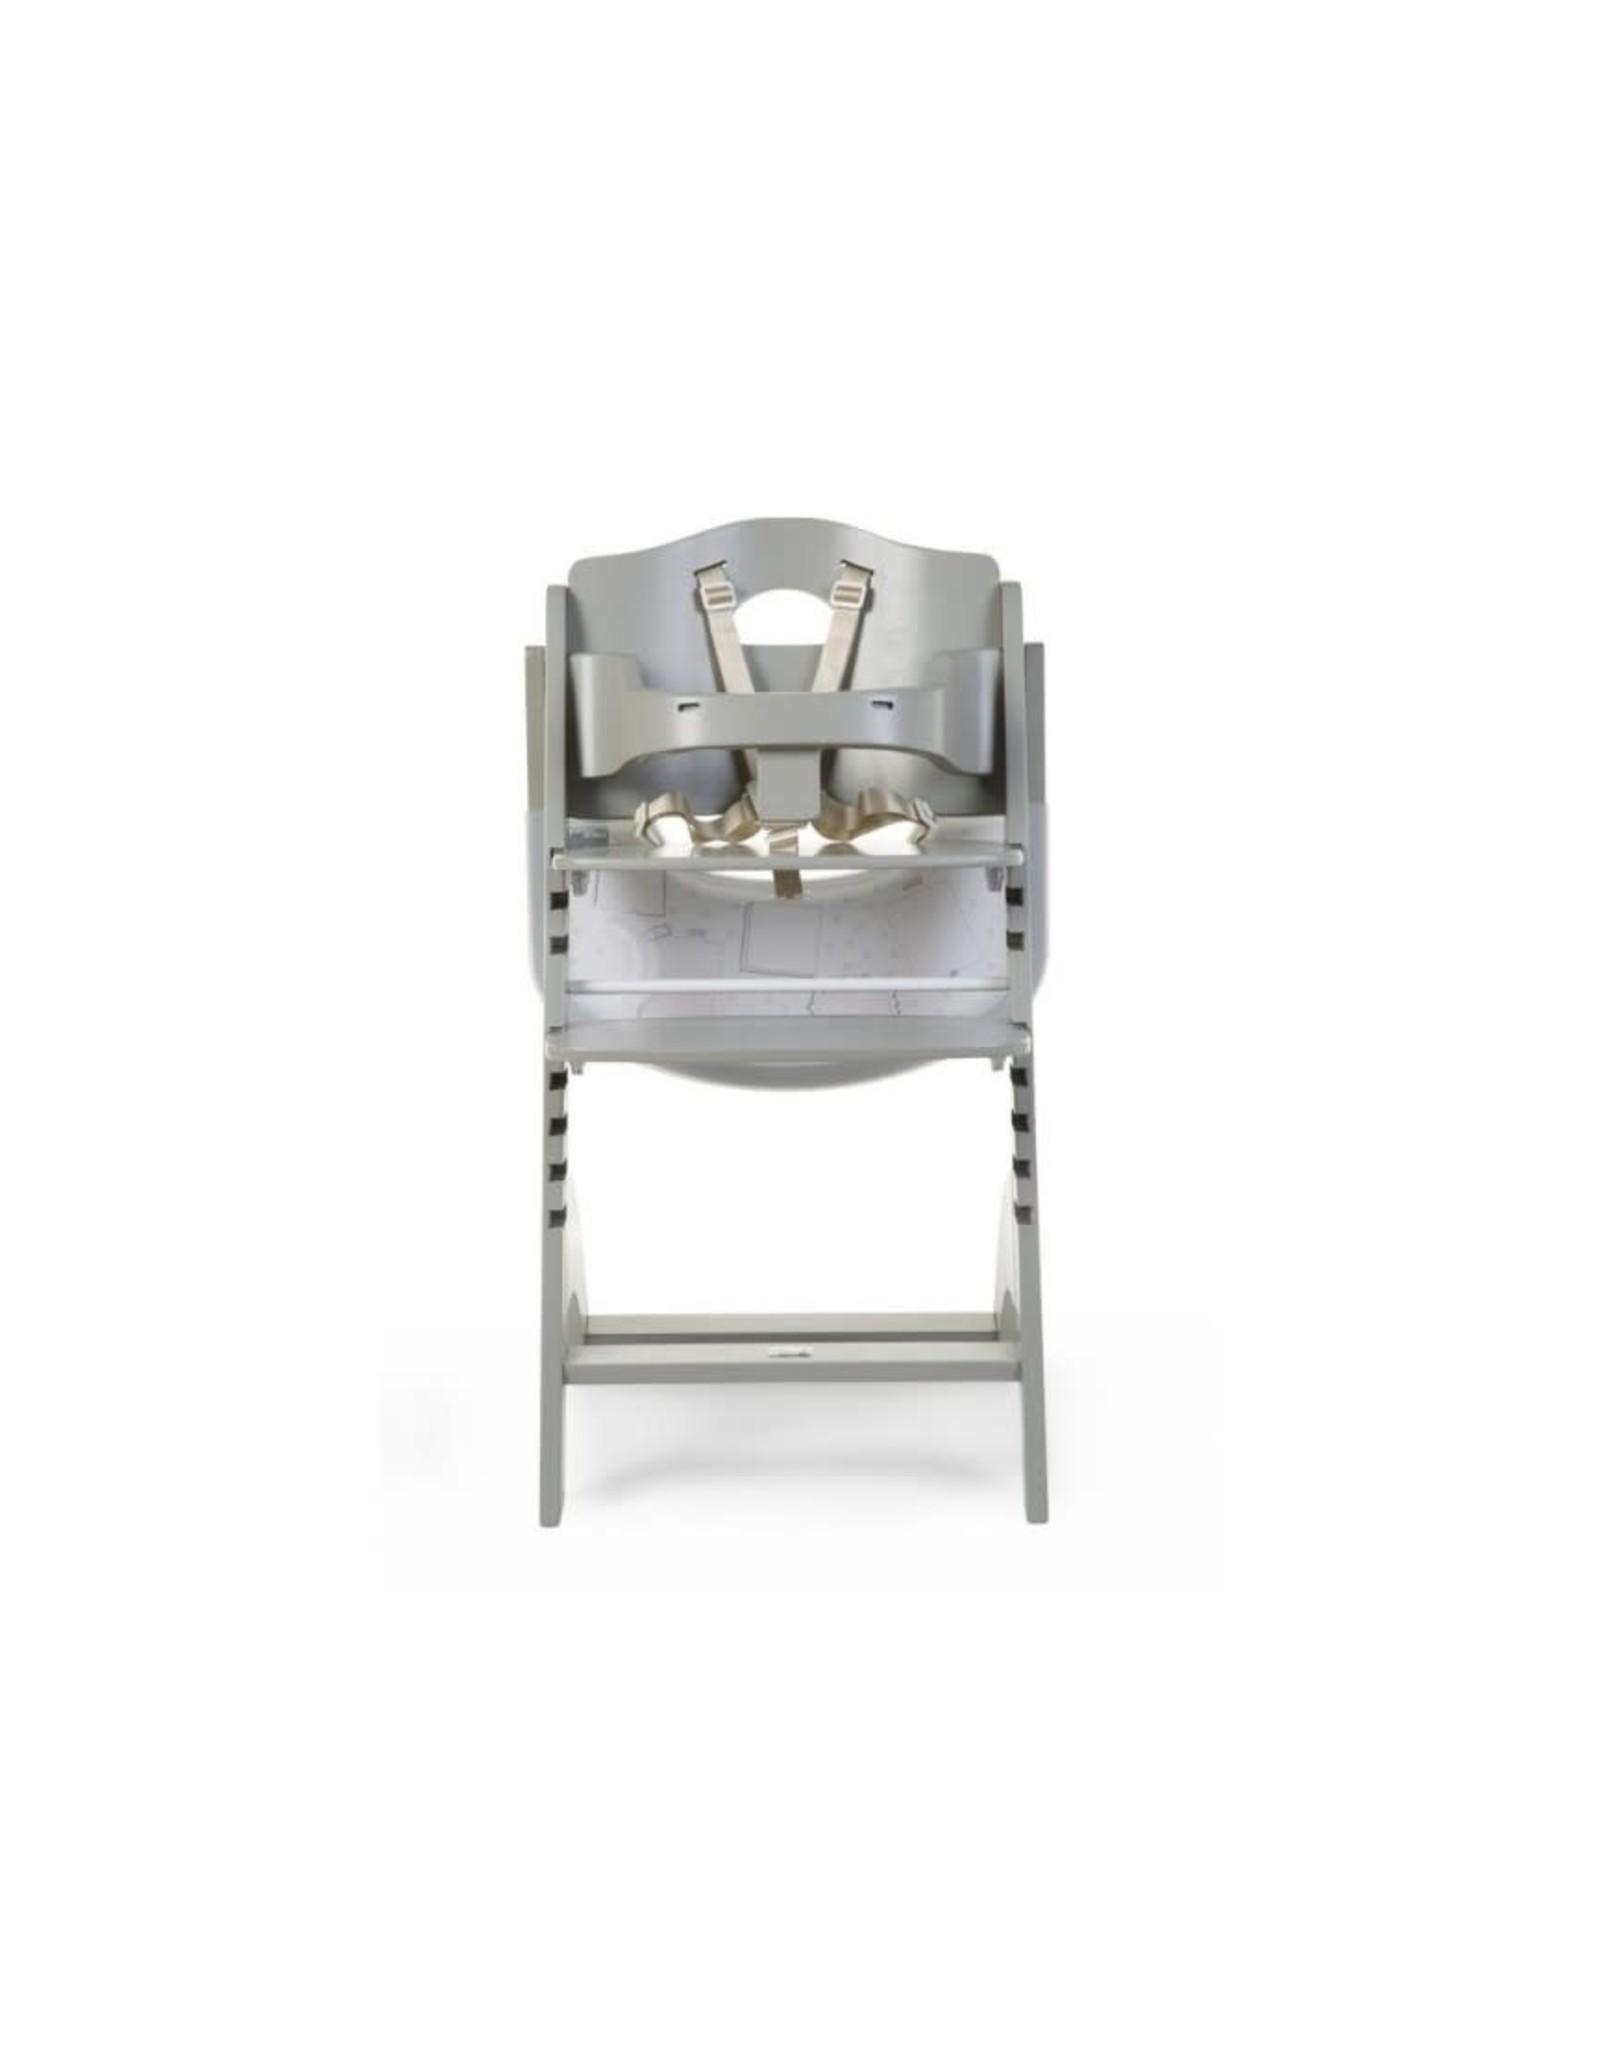 Childhome Childhome Lambda 3 Baby Kinderstoel + Eettablet - Hout - Stone Grijs